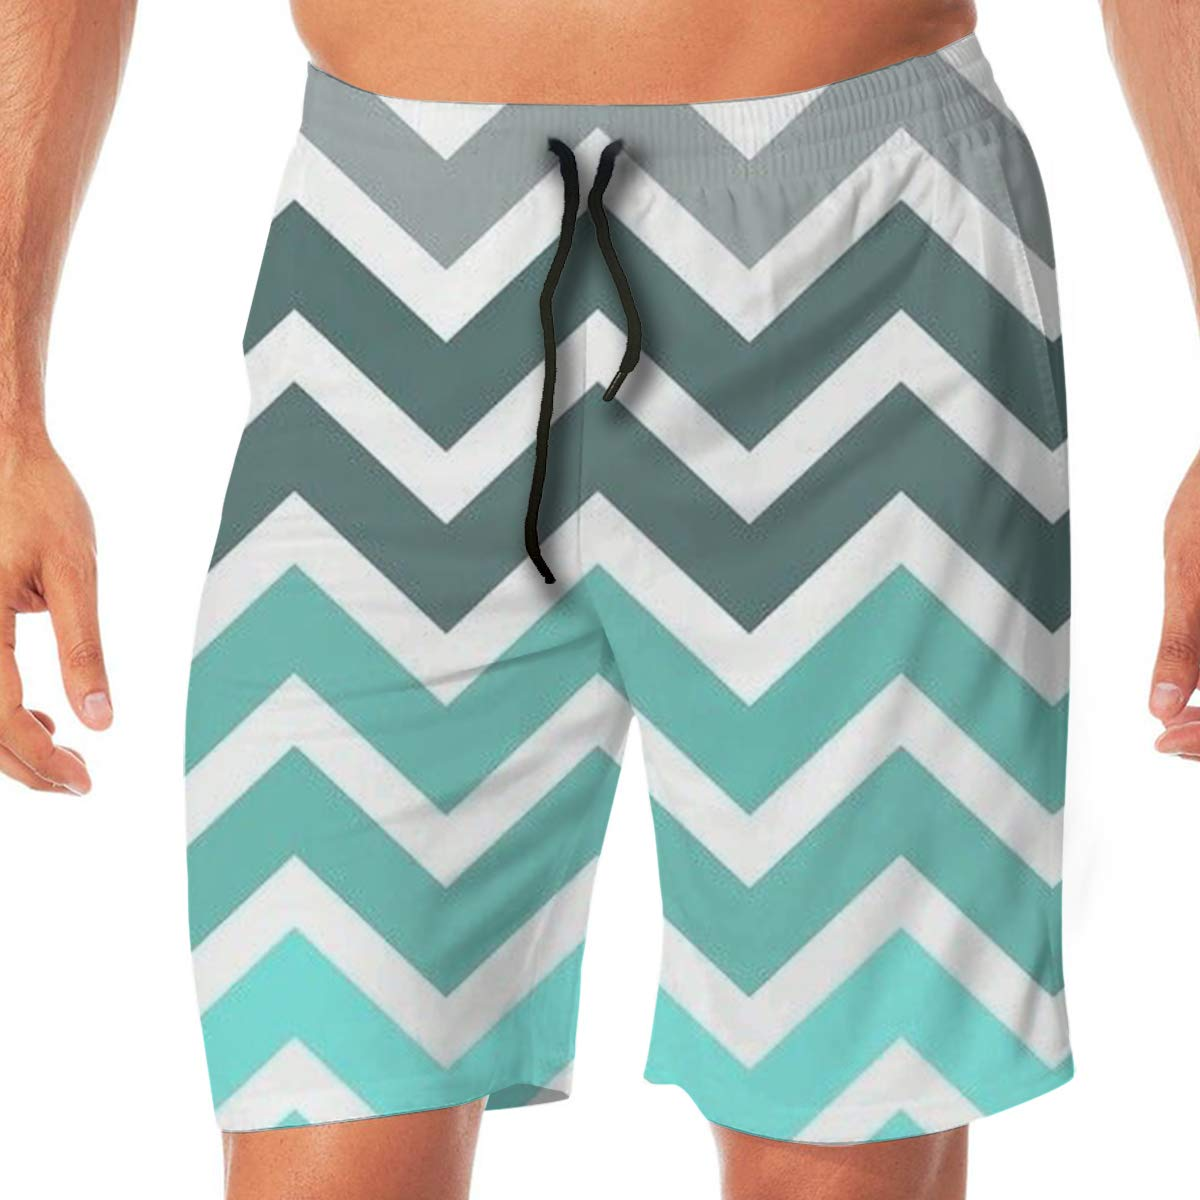 SEXTDSFD Wavy Stripes Mens Running Casual Short Beach Pants Swim Trunks Drawstring Board Shorts Swimwear